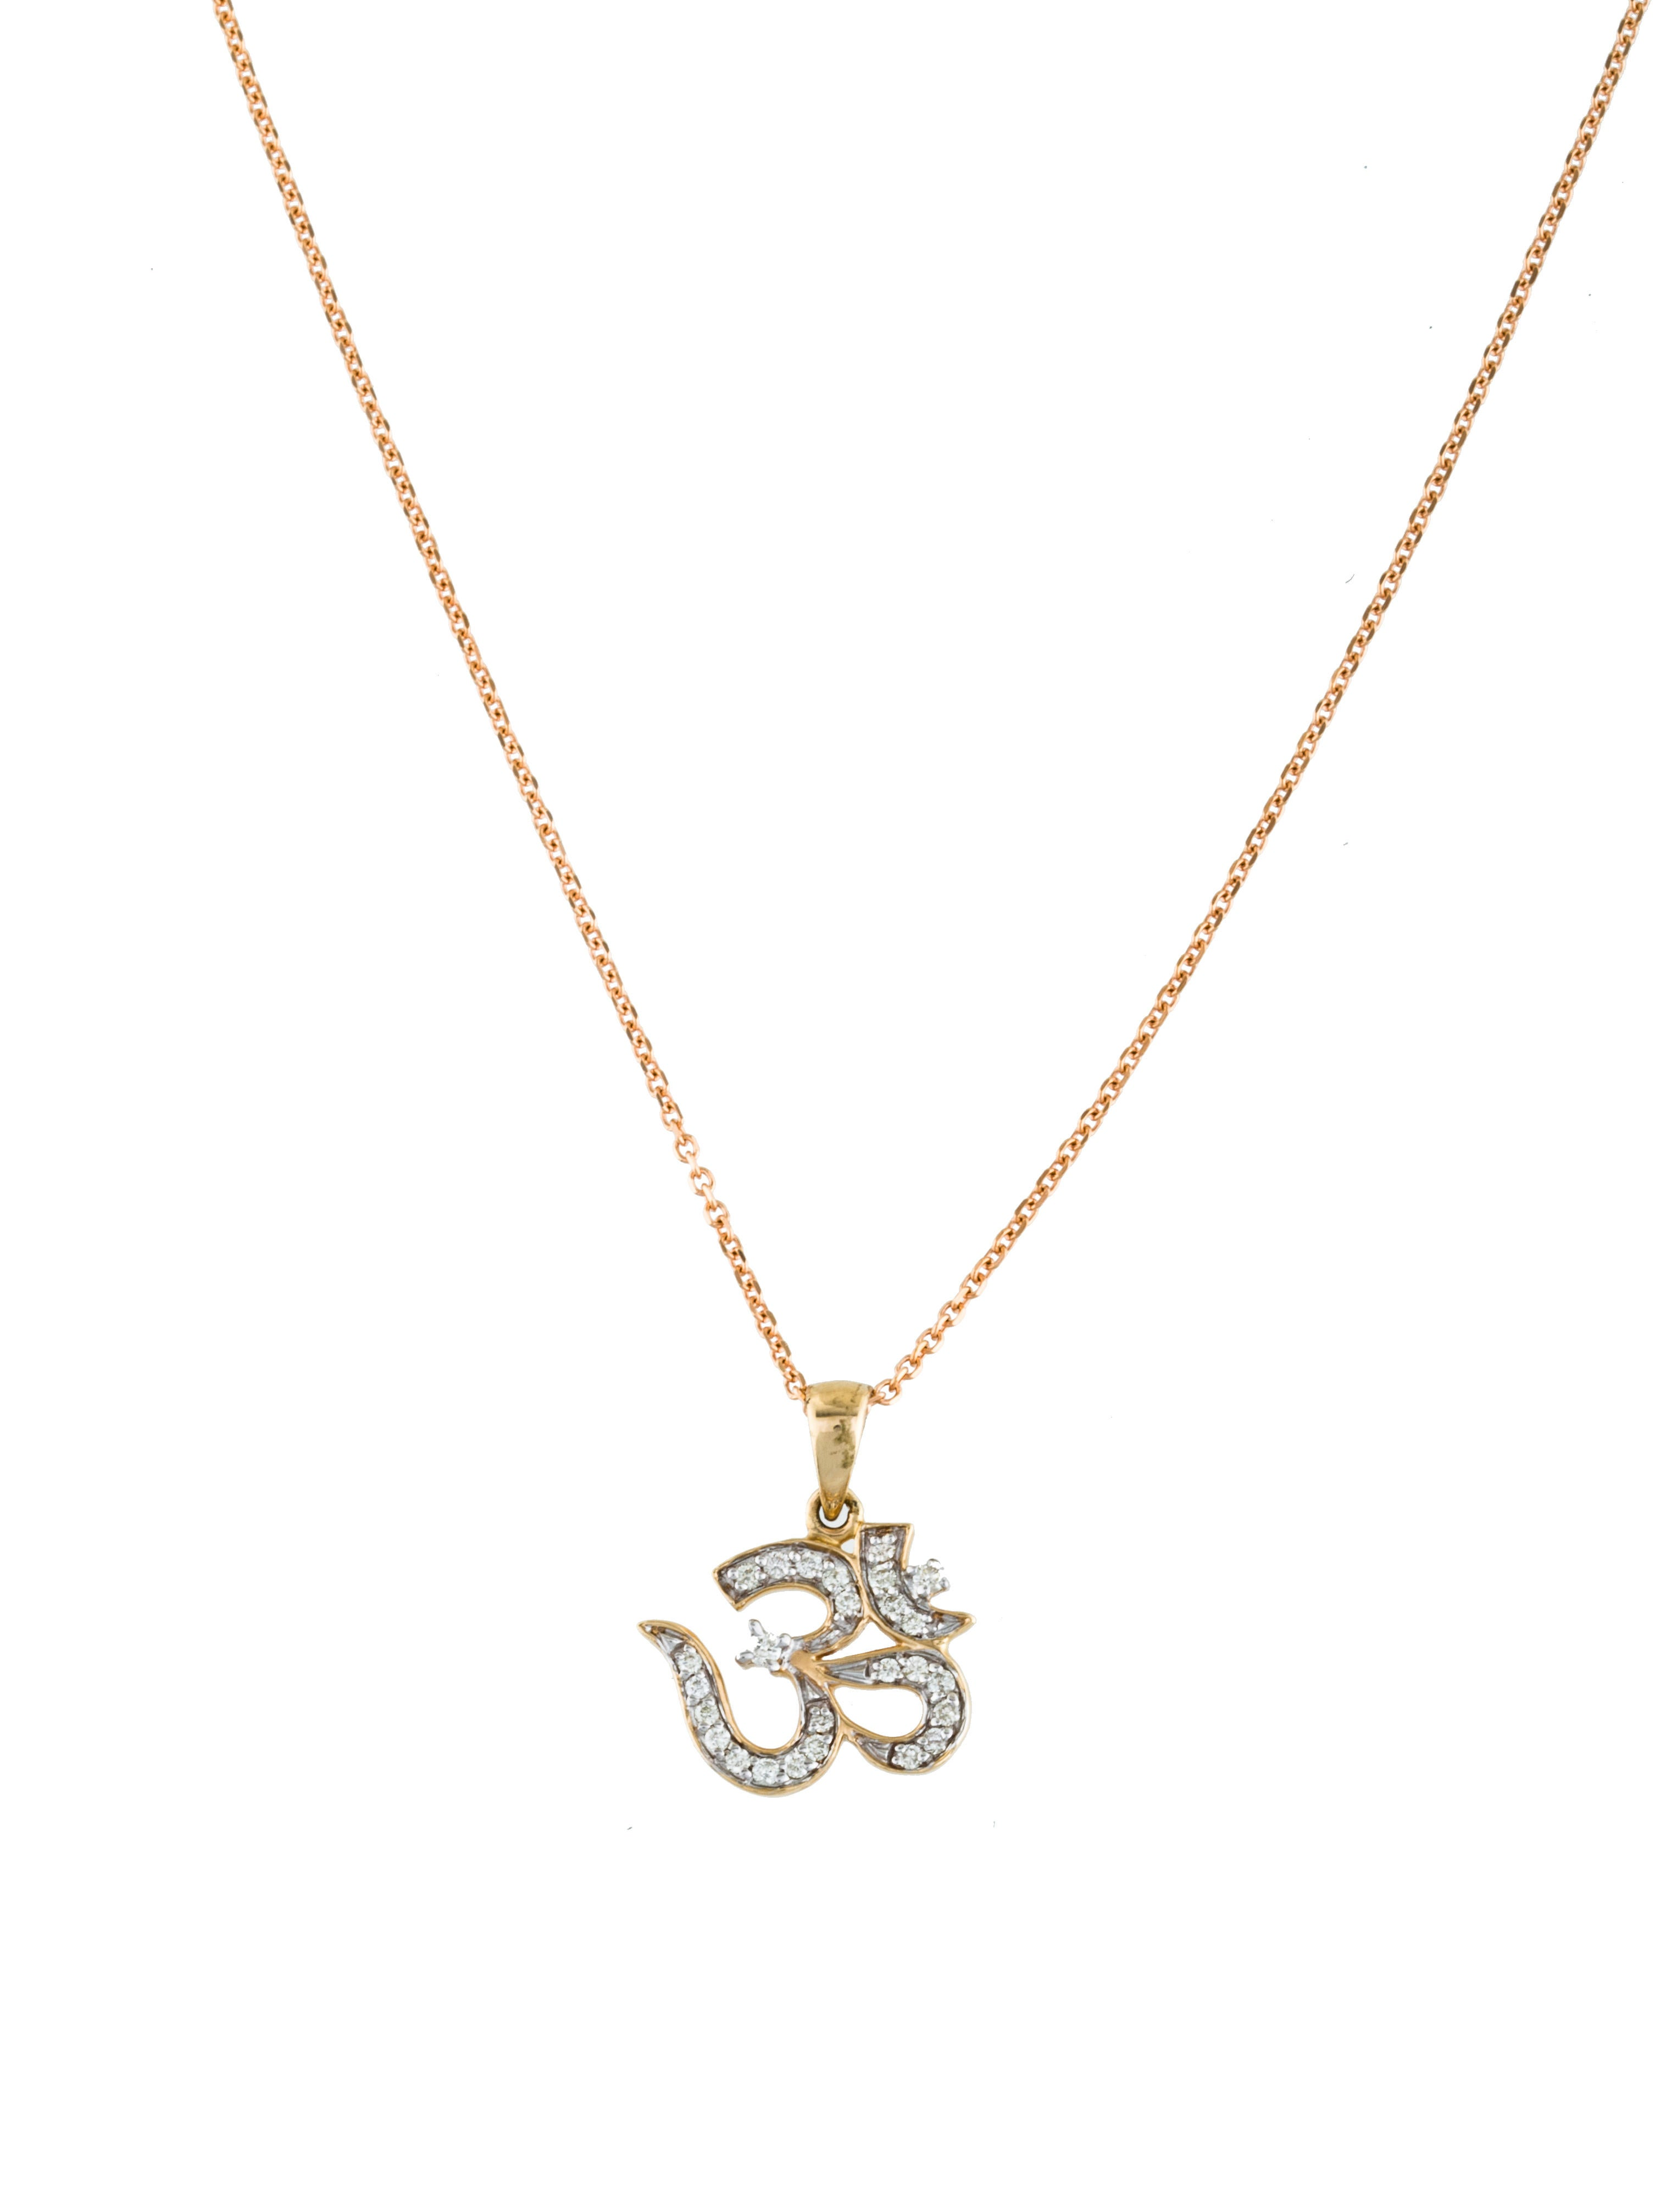 14k om pendant necklace necklaces neckl29689